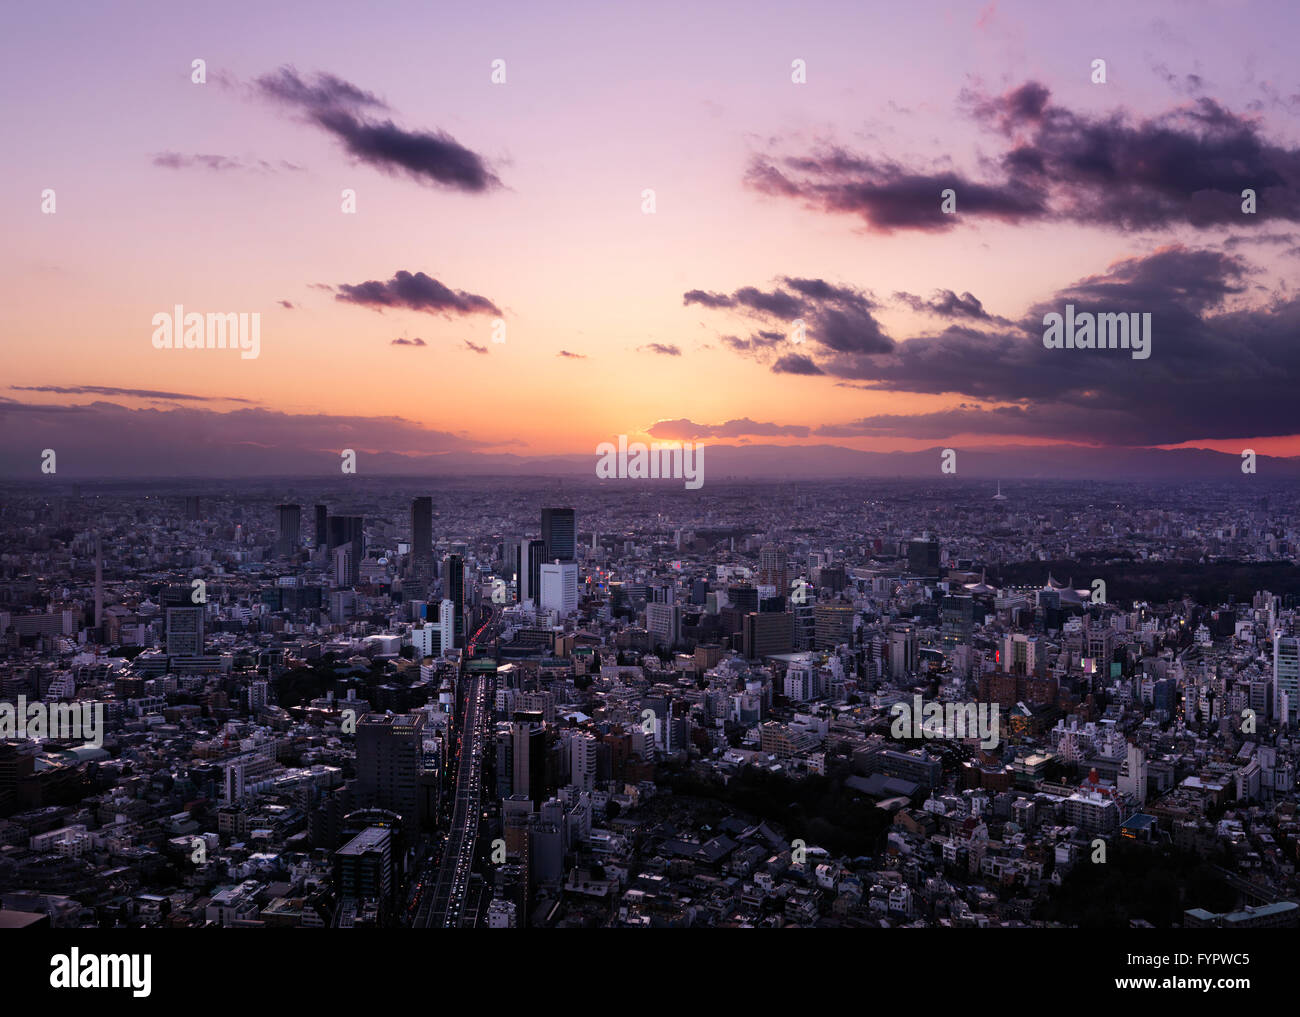 Stadtbild, bei Sonnenuntergang, Shibuya, Tokyo, Japan Stockbild